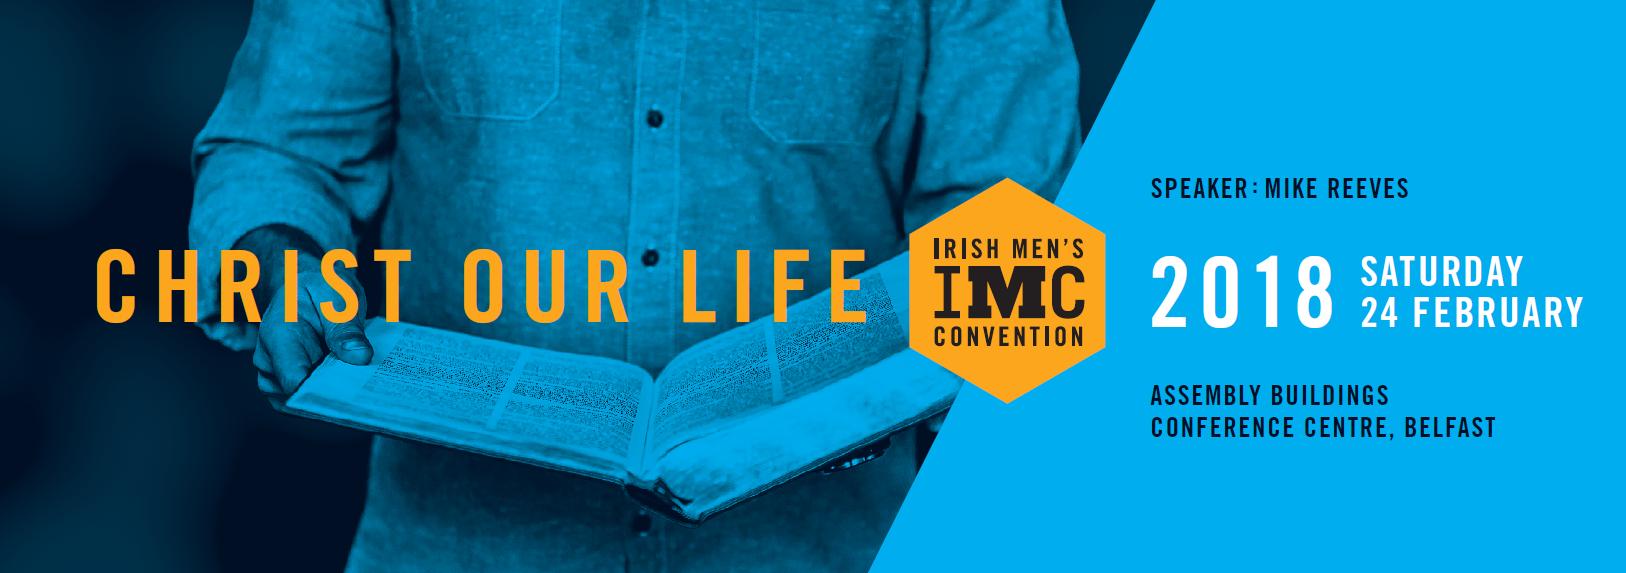 IMC 2018 - Christ Our Life